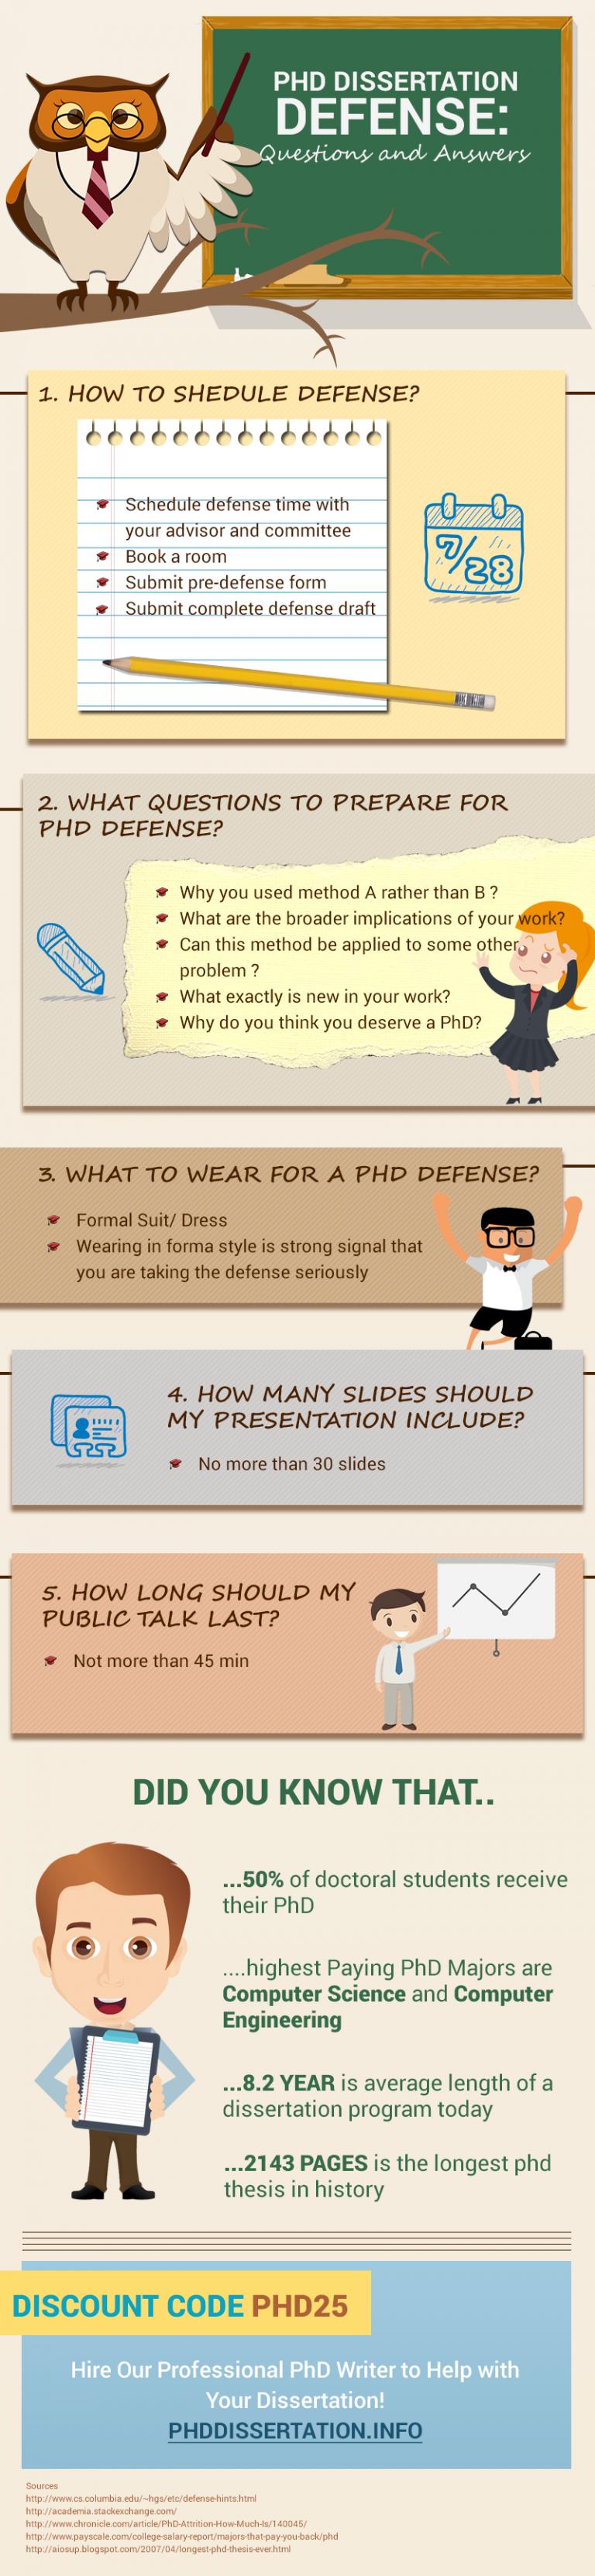 phd dissertation reviews